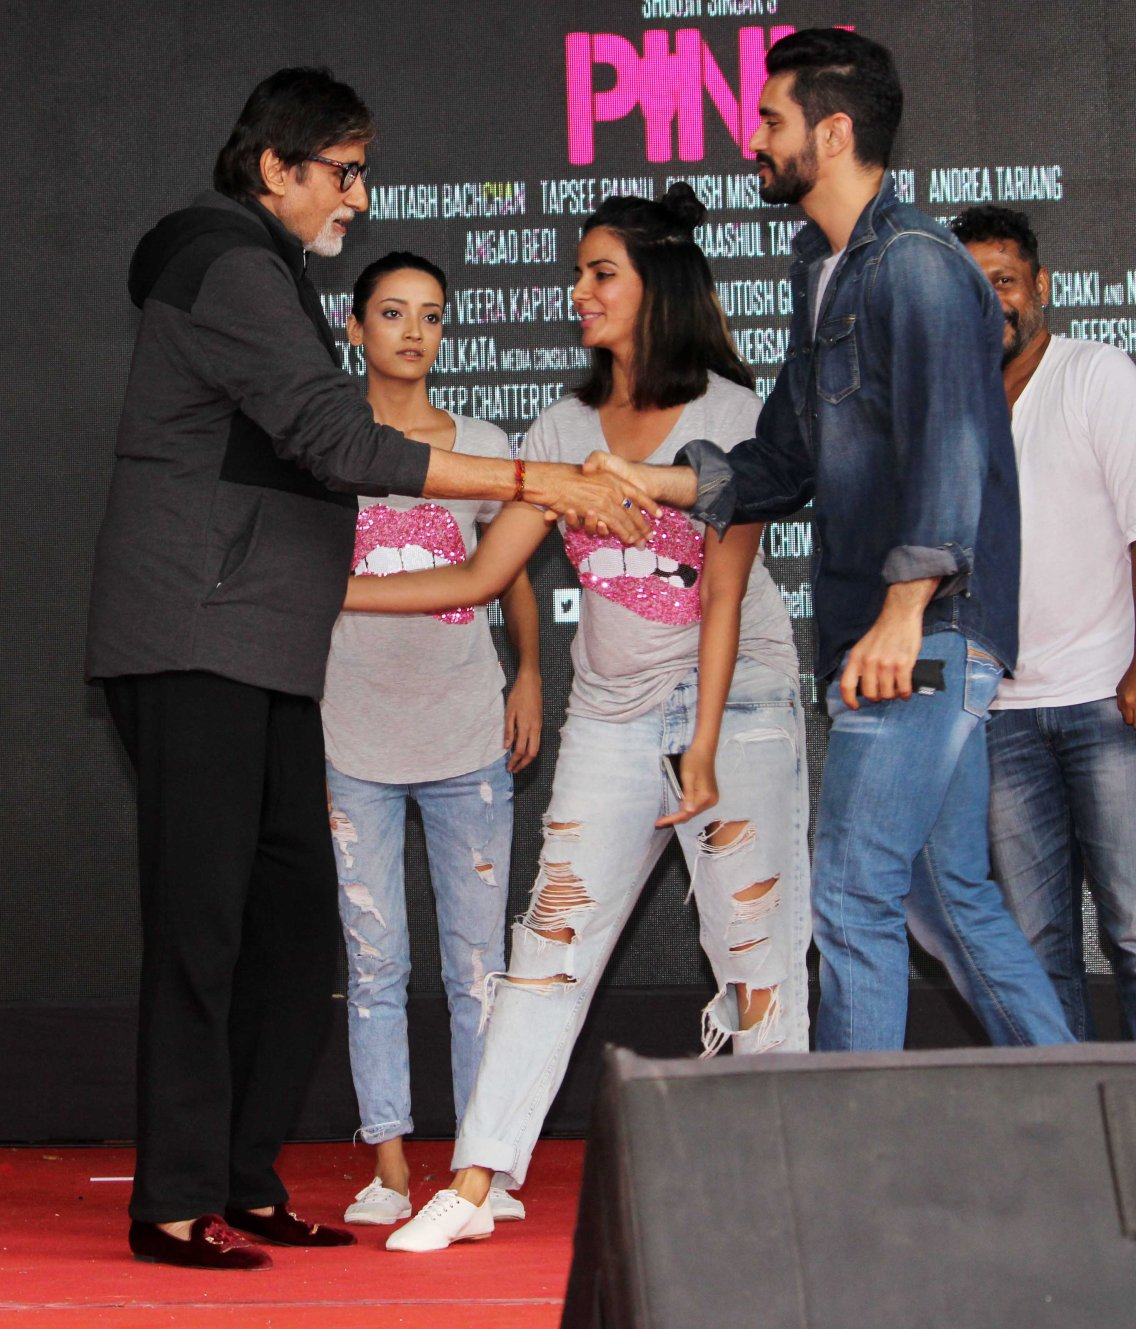 Amitabh Bachchan, Andrea, Kirti,Angad Bedi and Shoojit Sircar